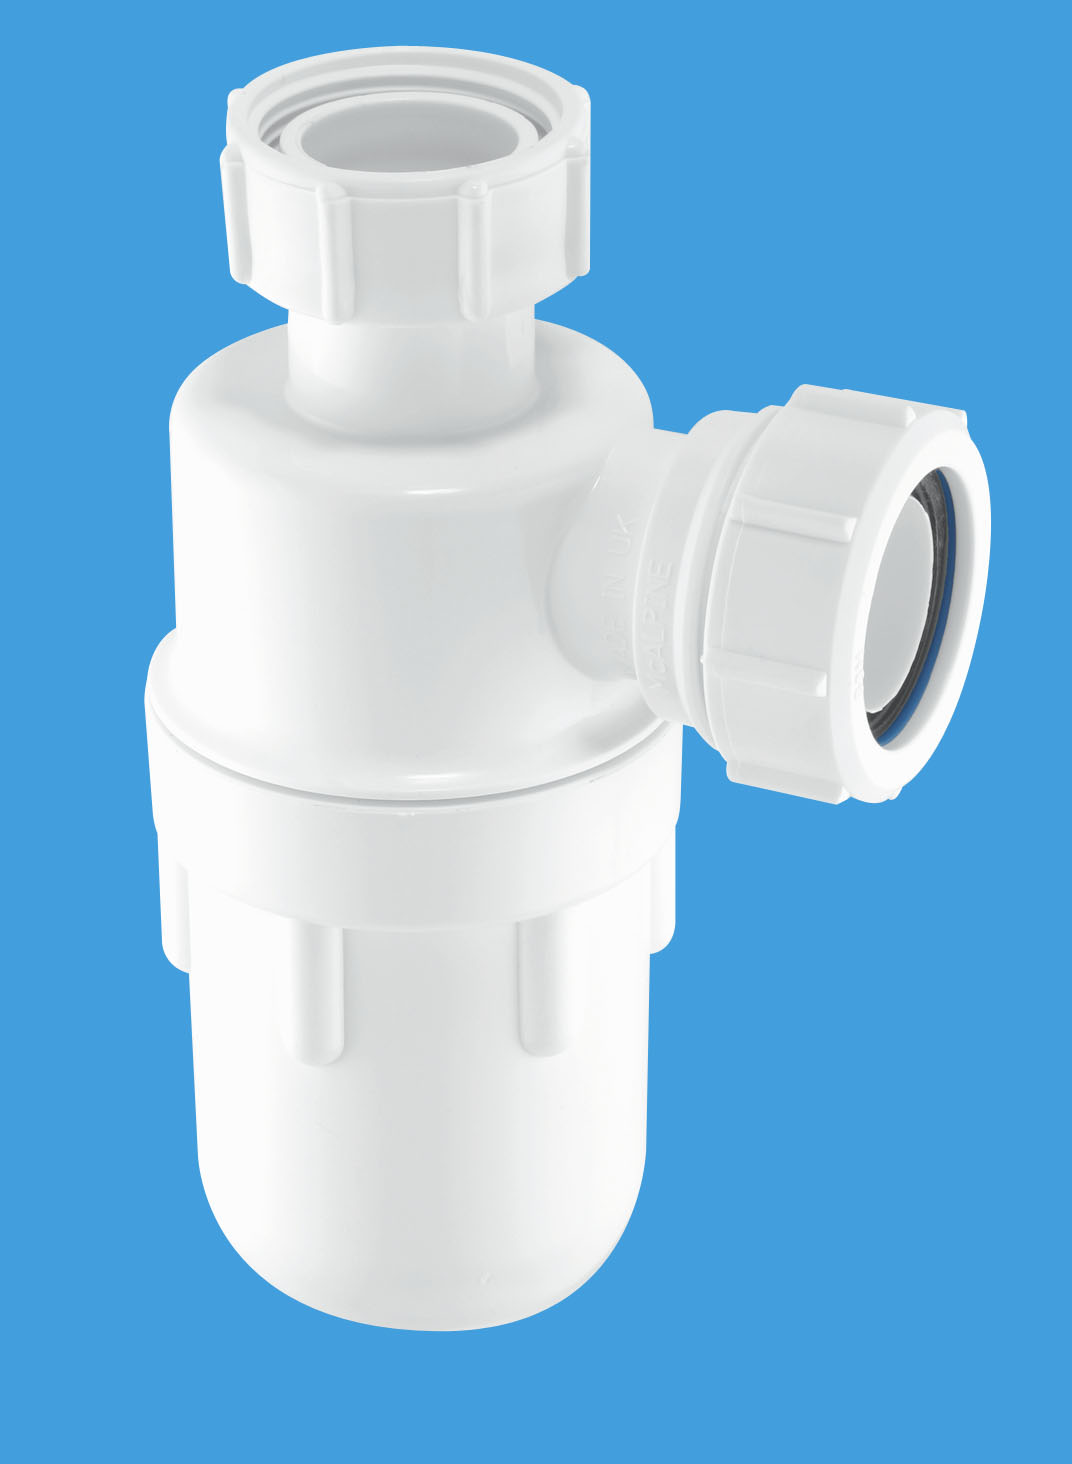 Enjoyable Bottle Trap Mcalpine Plumbing Products Download Free Architecture Designs Scobabritishbridgeorg